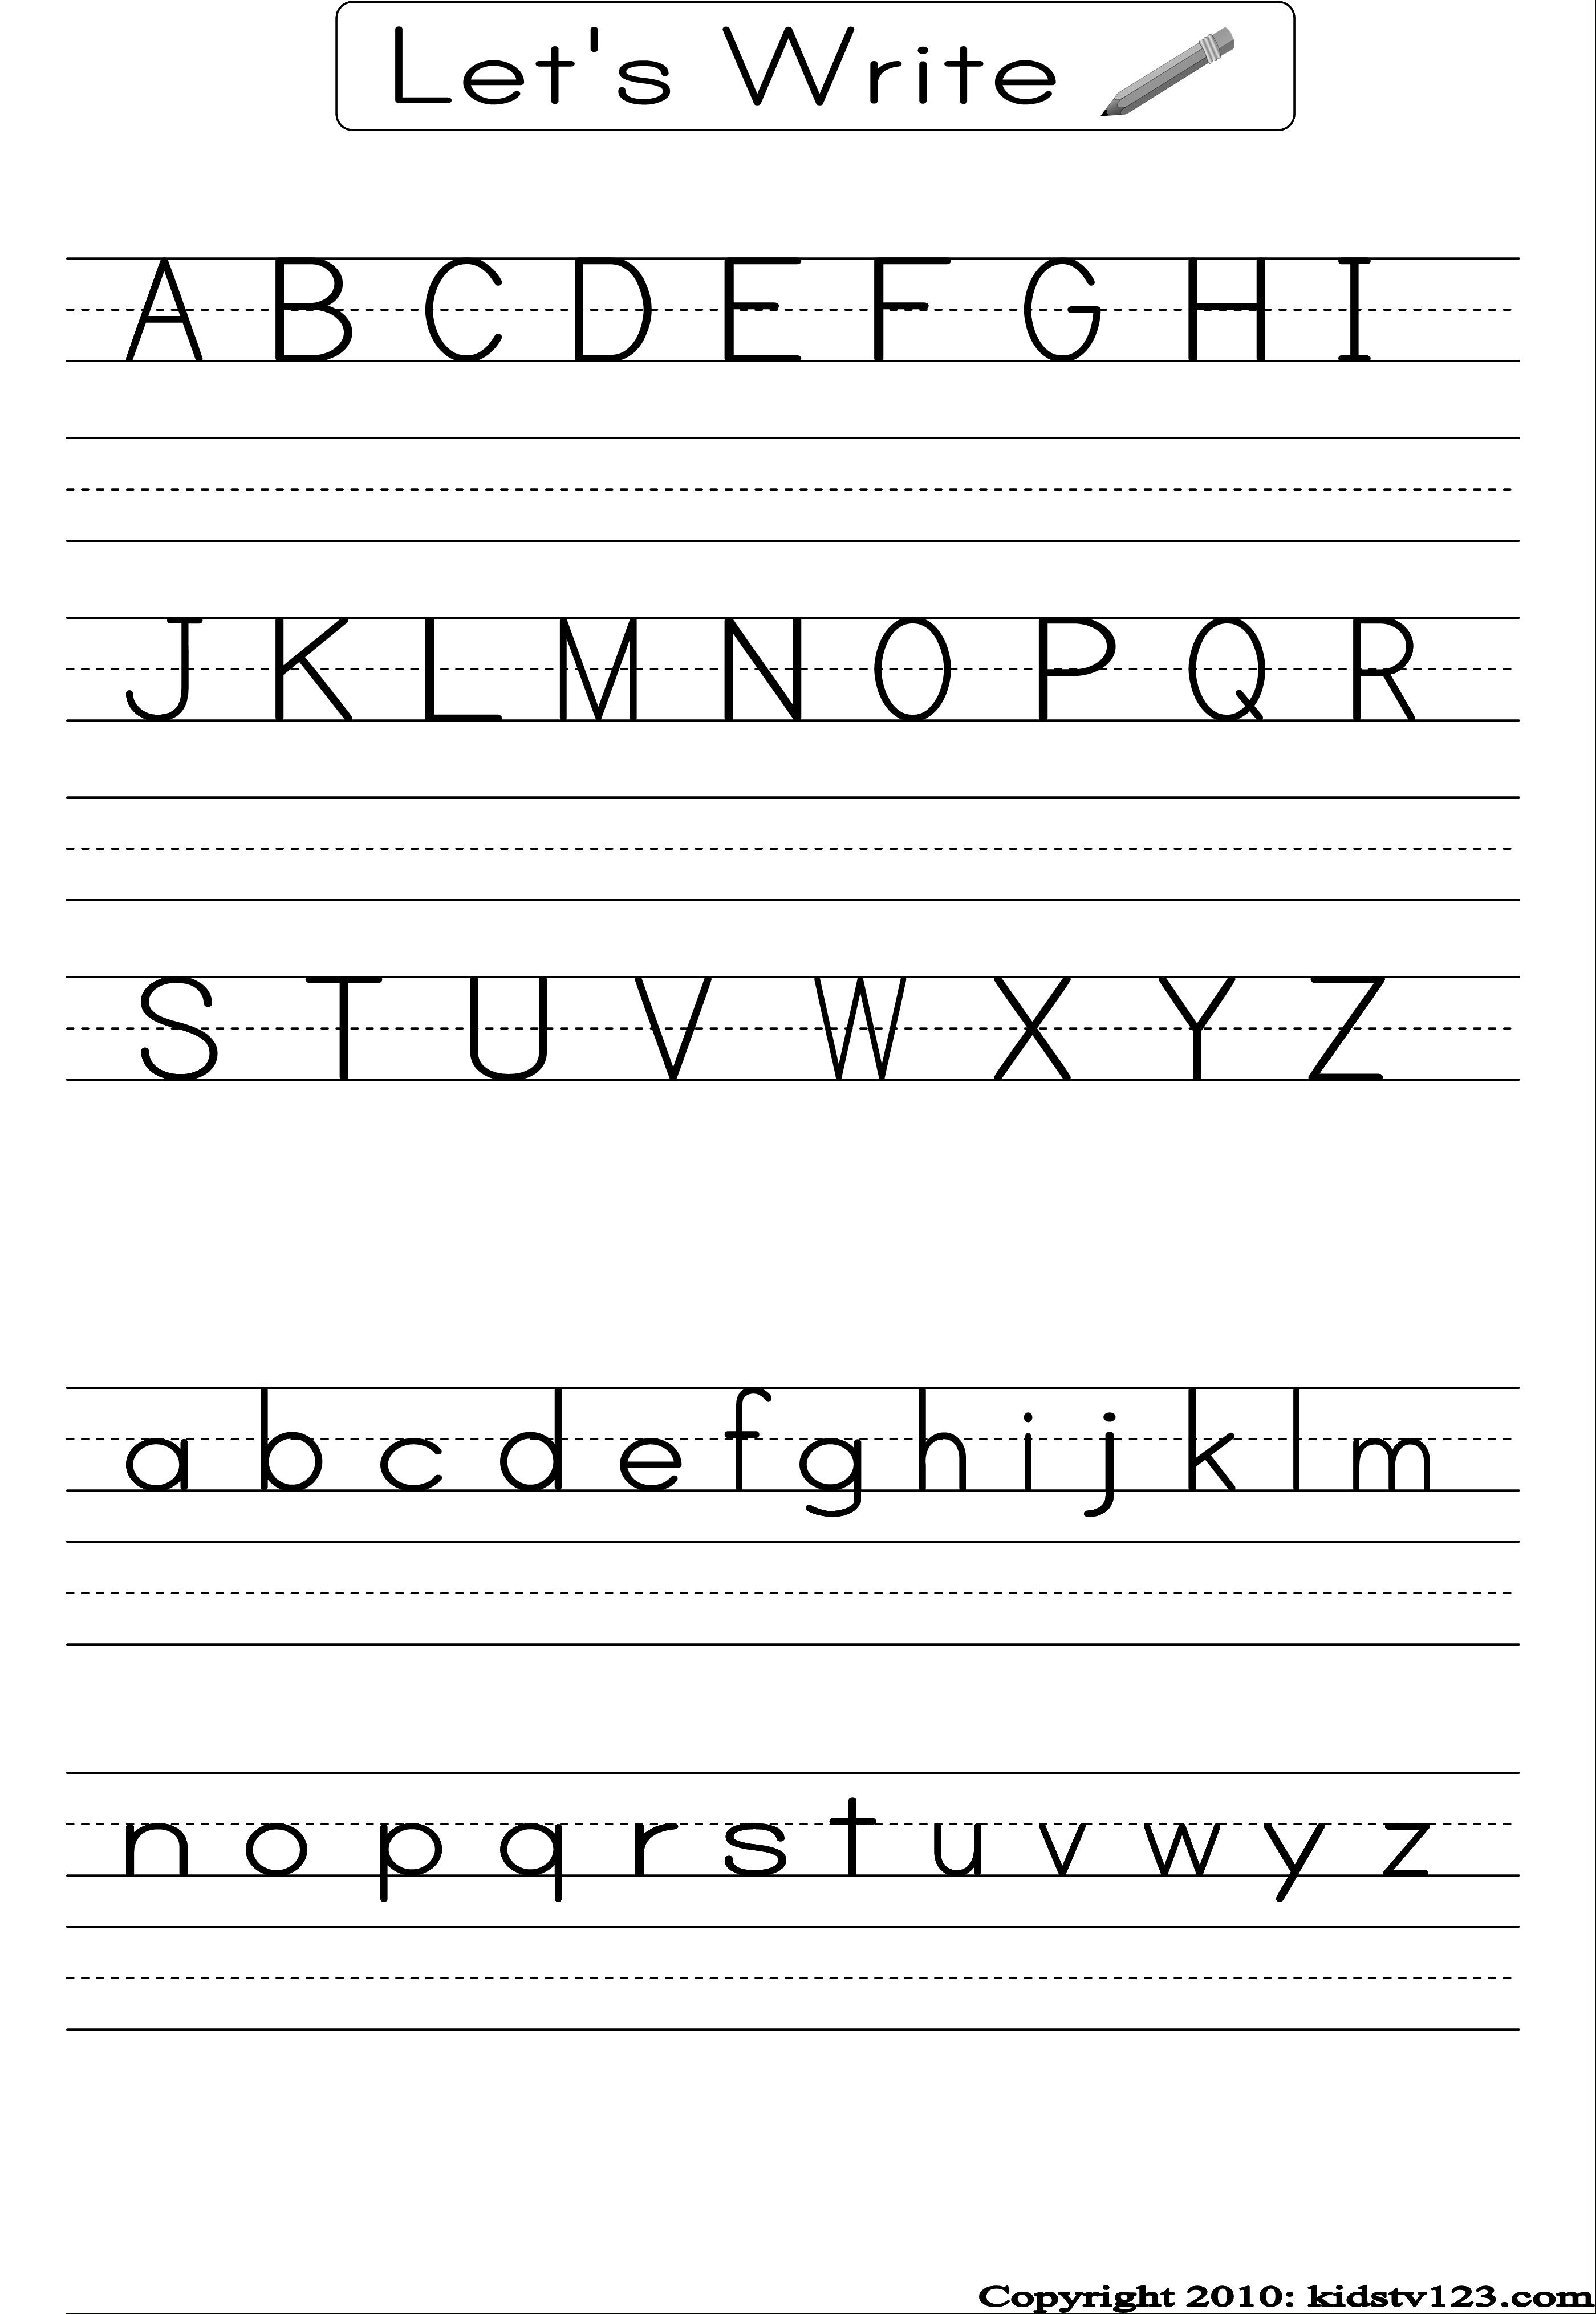 Free Printable Alphabet Worksheets, Preschool Writing And Pattern - Free Printable Letter Writing Worksheets